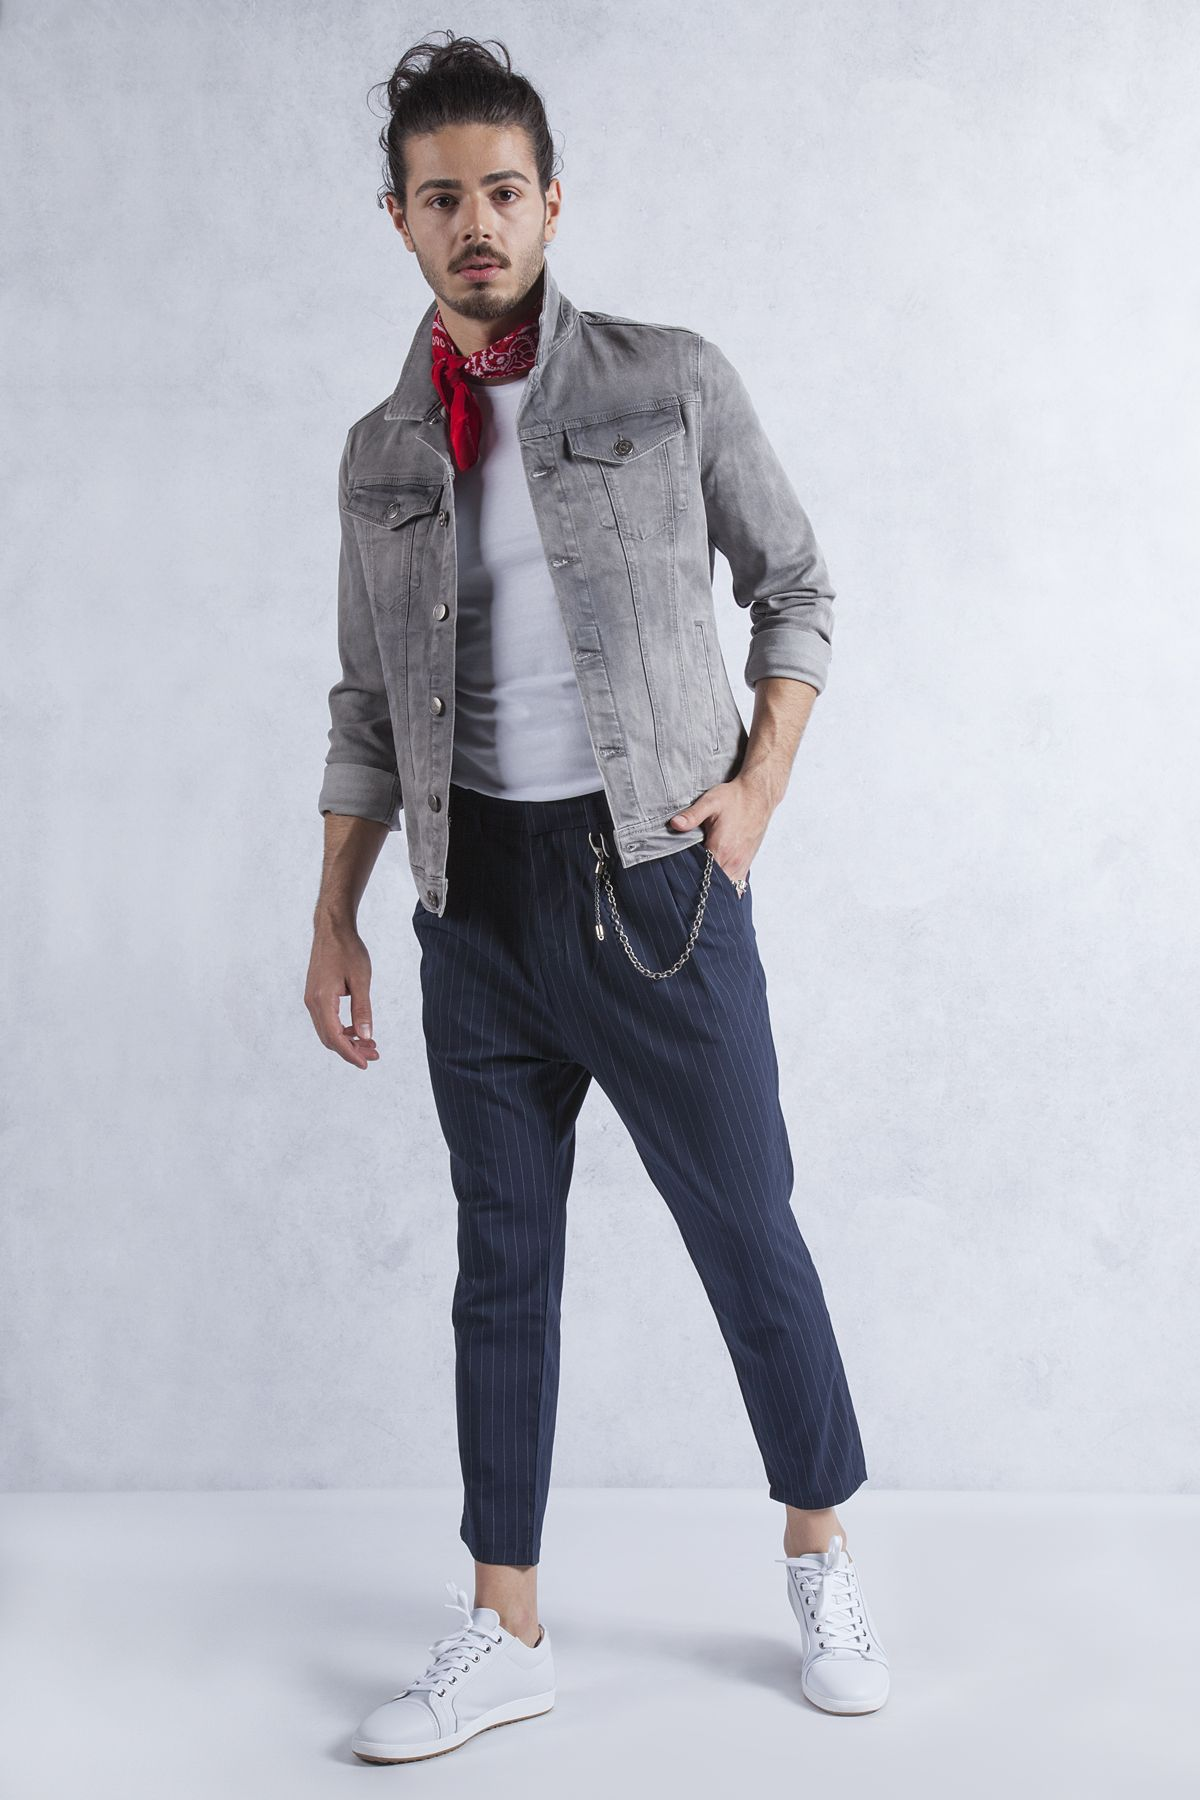 Cizgili Lacivert Kumas Pantolon Kombini Lacivert Cizgili Keten Pantolonun Uzerine Beyaz Bisiklet Yaka T Shirt Ve Gri Ko Kumas Pantolonlar Pantolon Kot Ceket